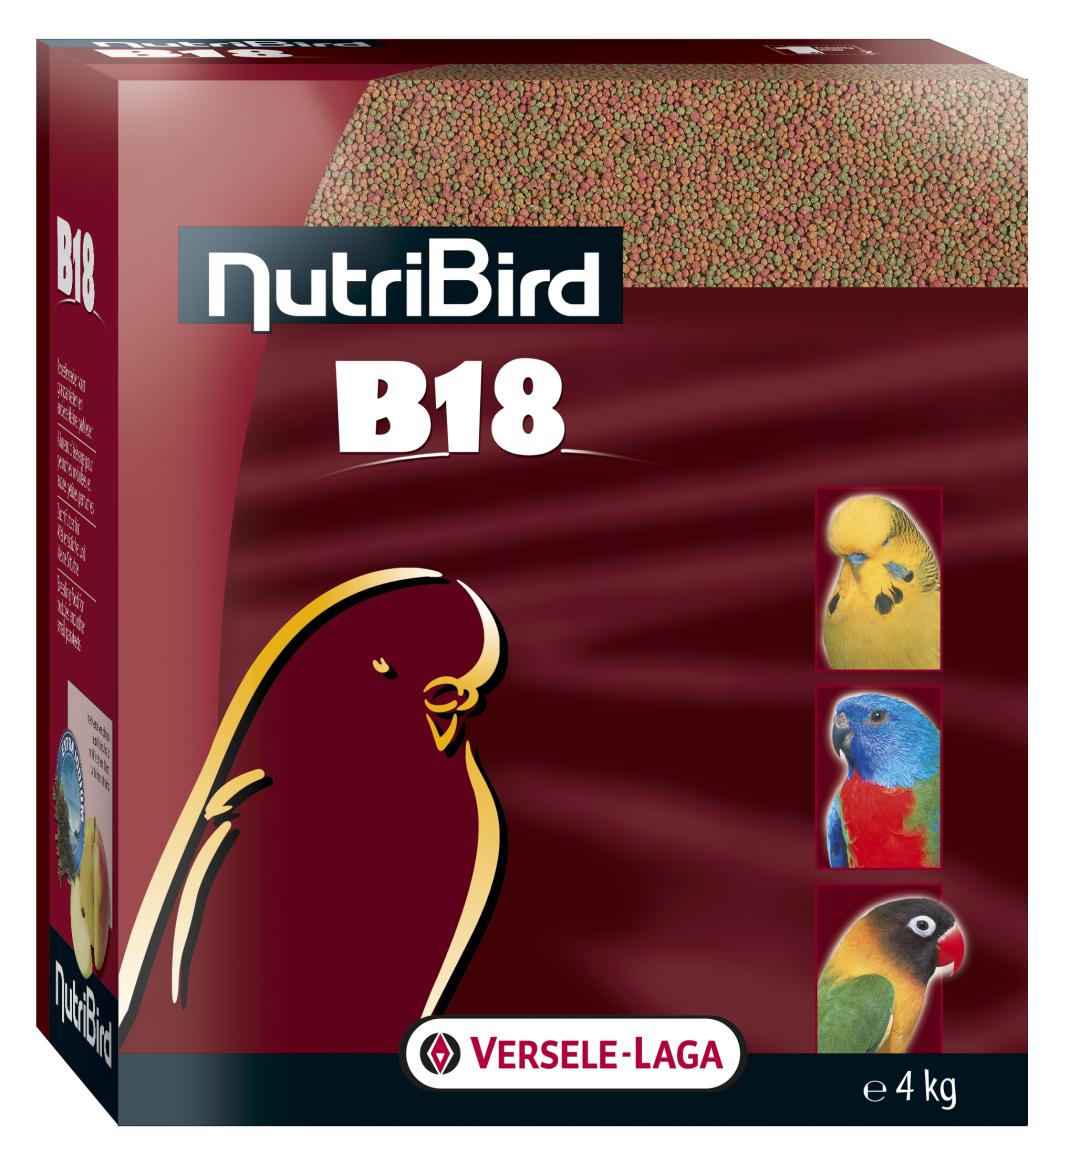 Nutribird B18 kweekvoeder 4 kg